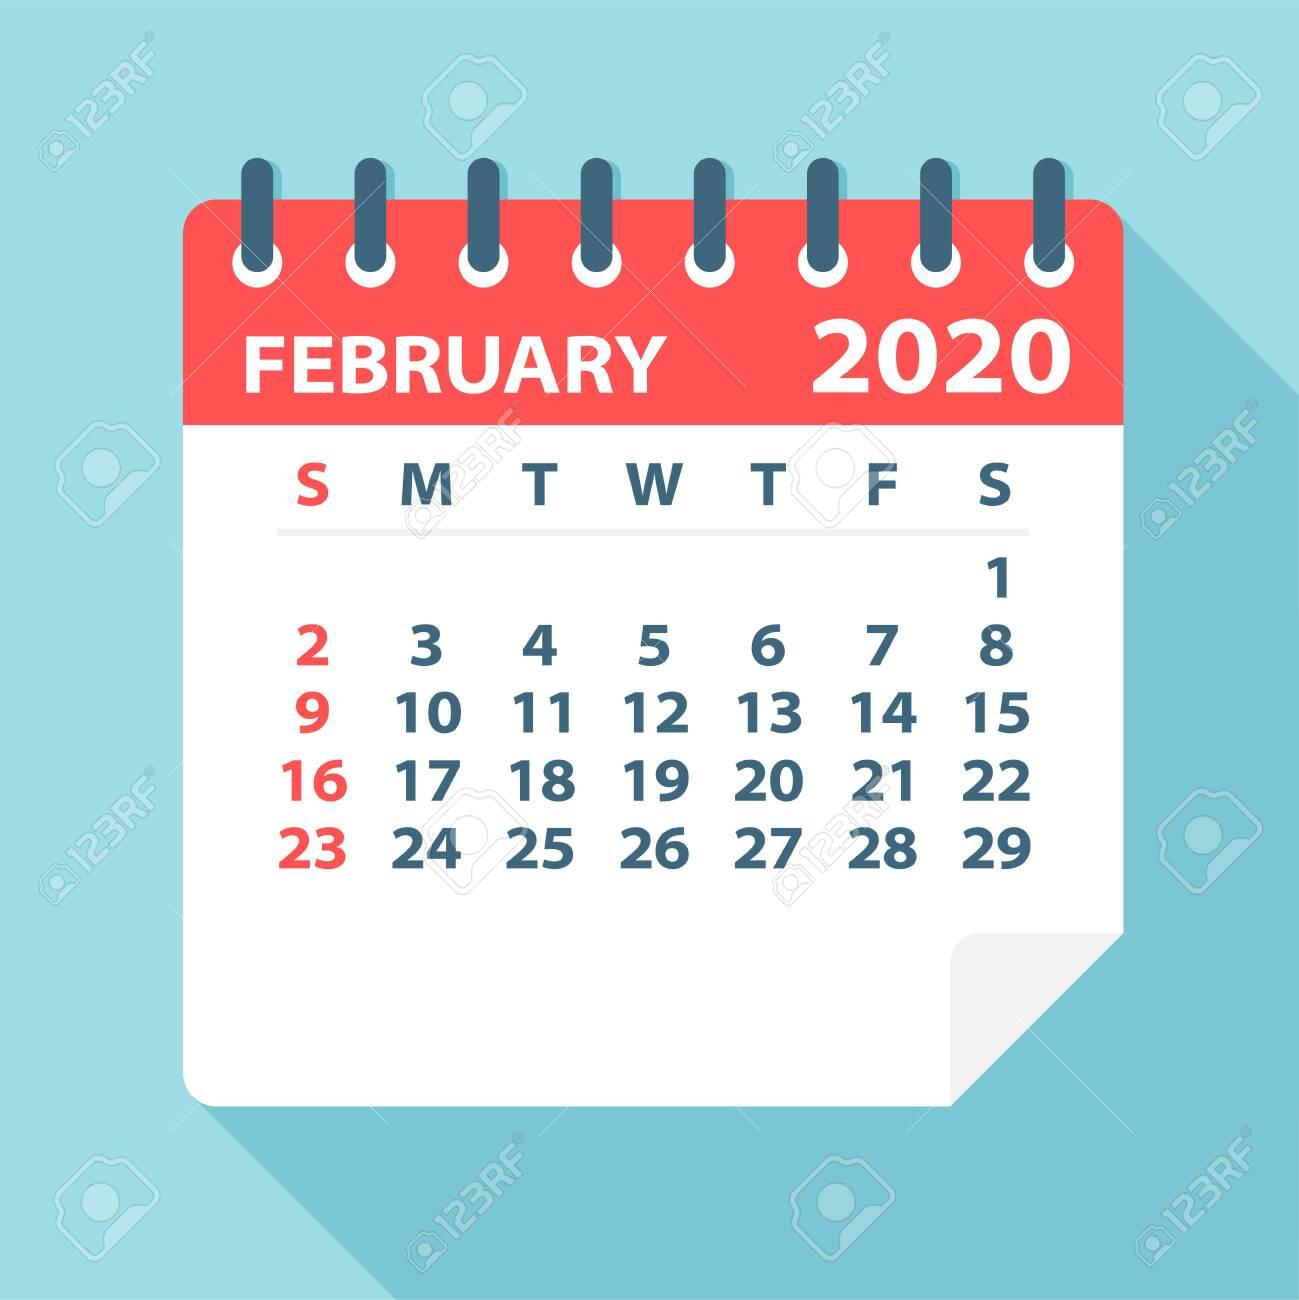 Feb Calendar 2020 - Wpa.wpart.co